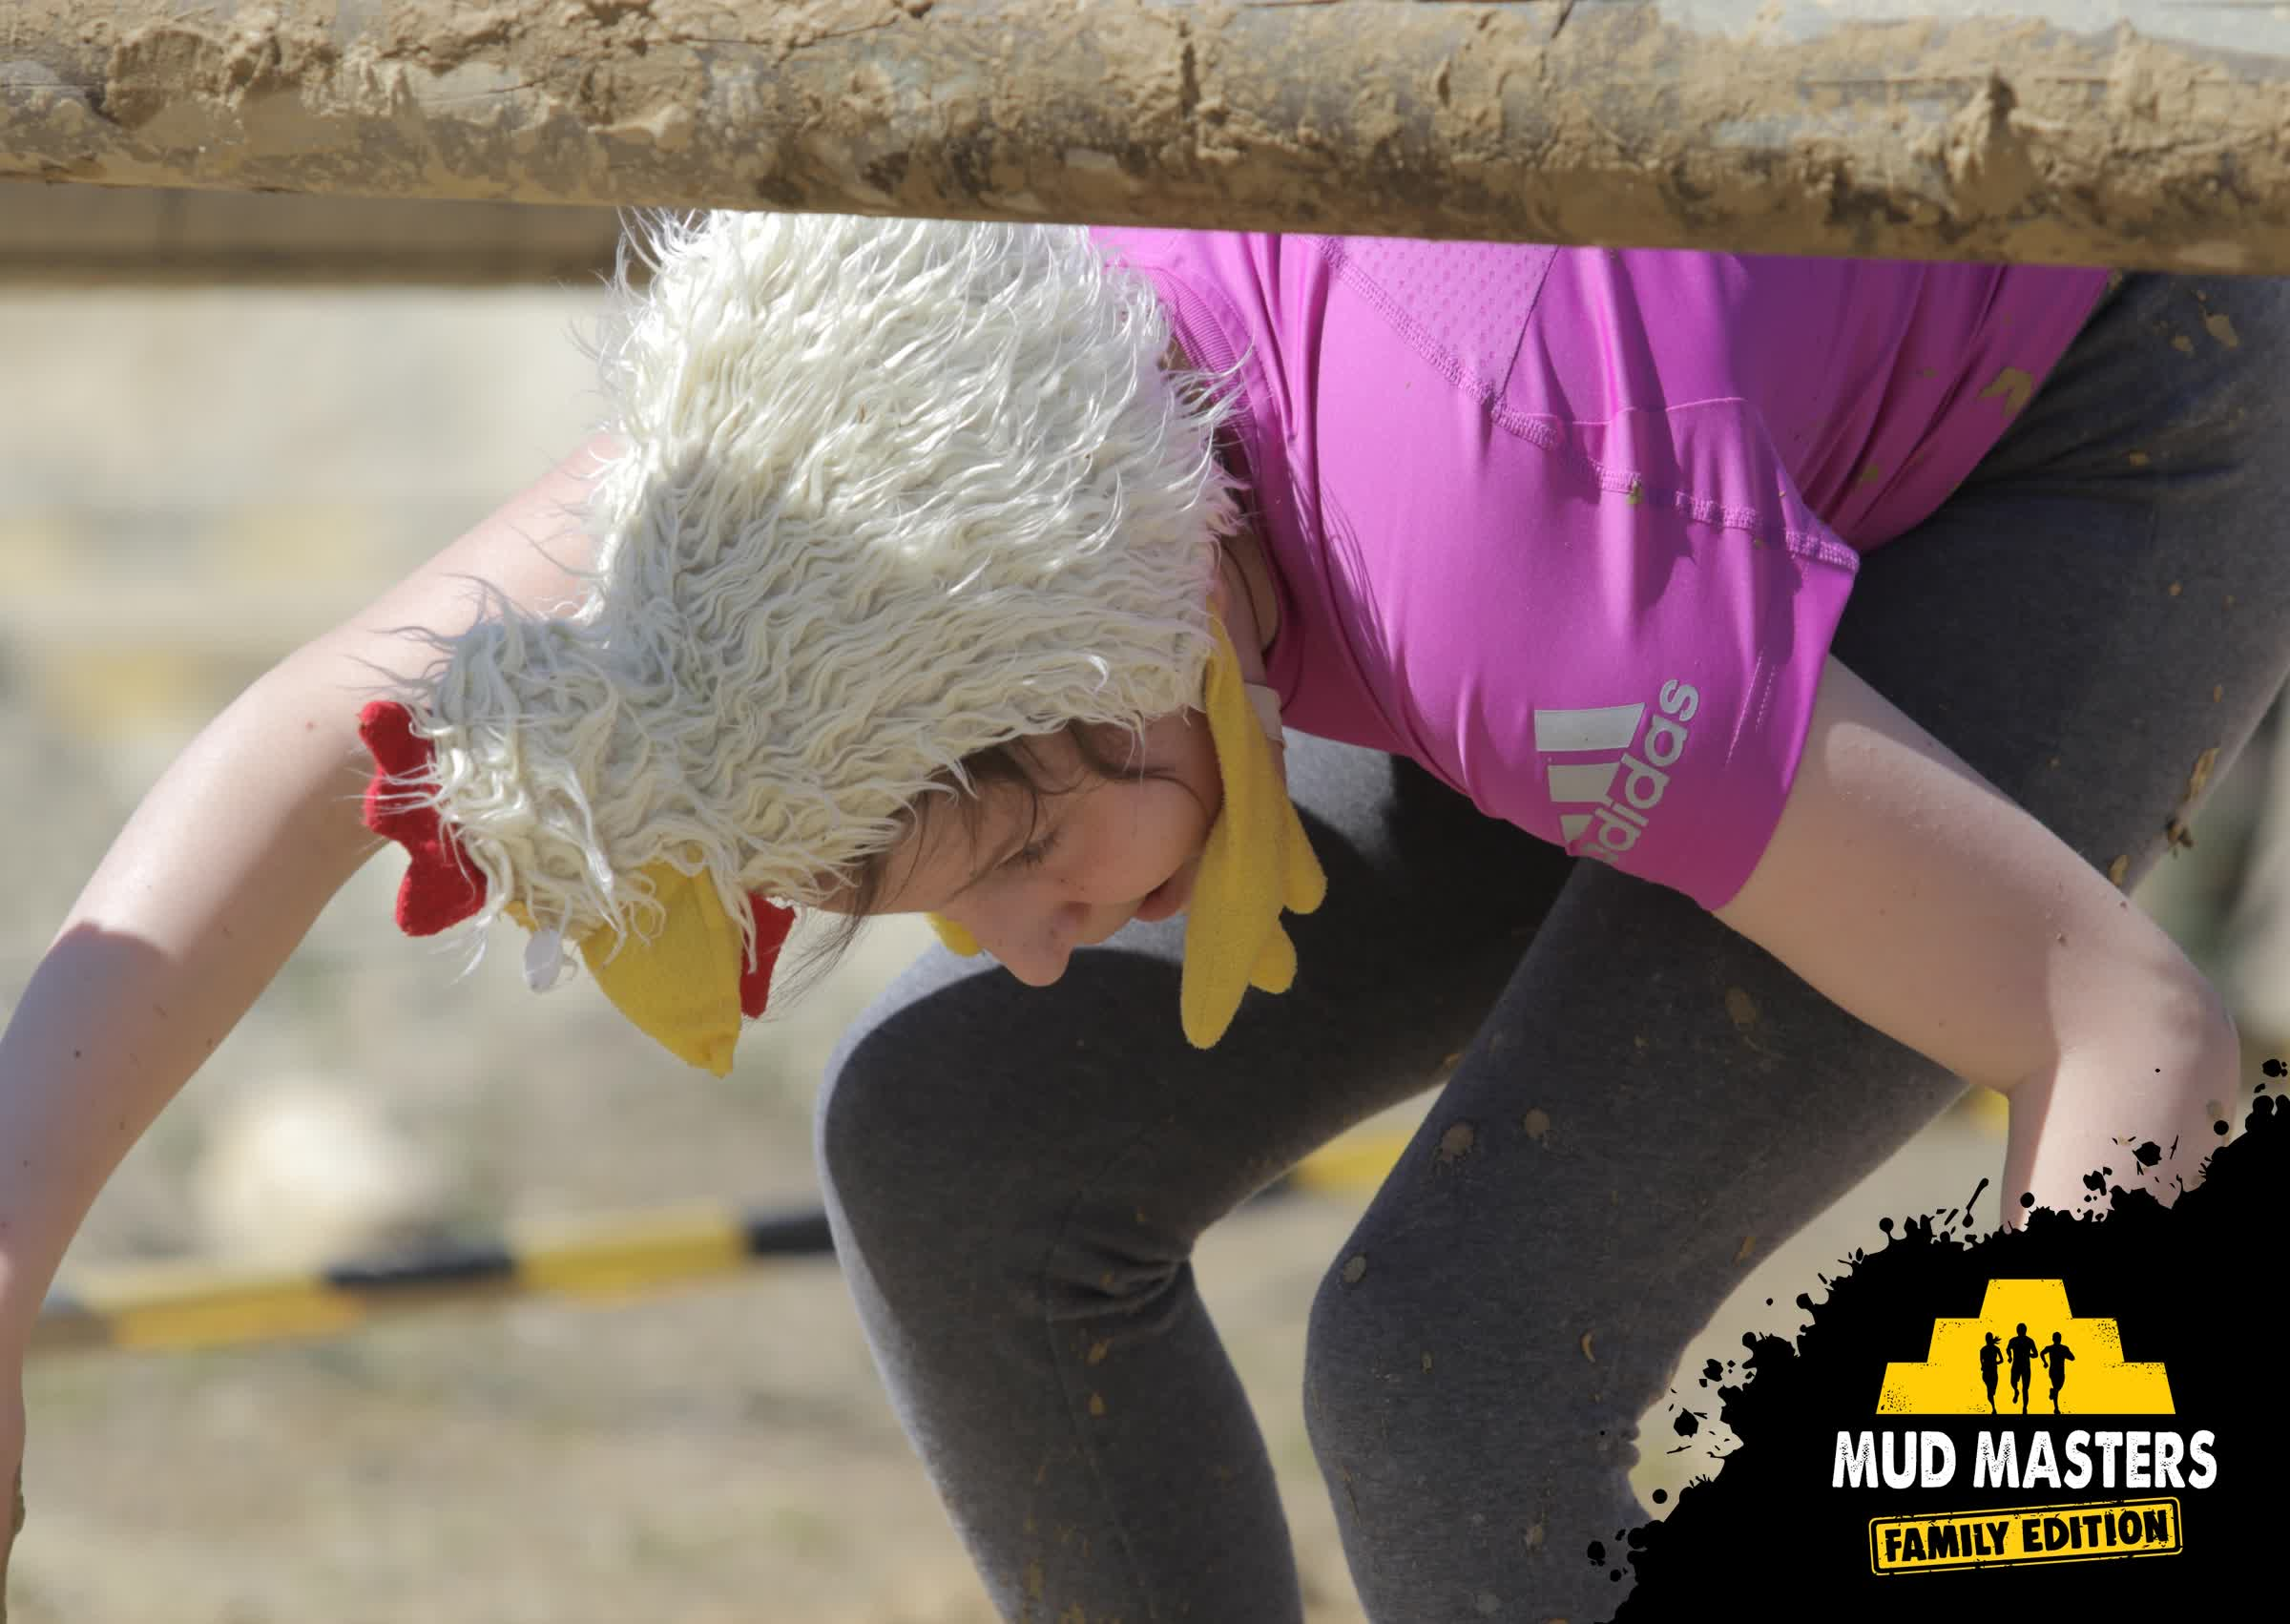 Mud Masters Obstacle Run Family Run, Hindernislauf Deutschland, Tough Chicken Family Tochter